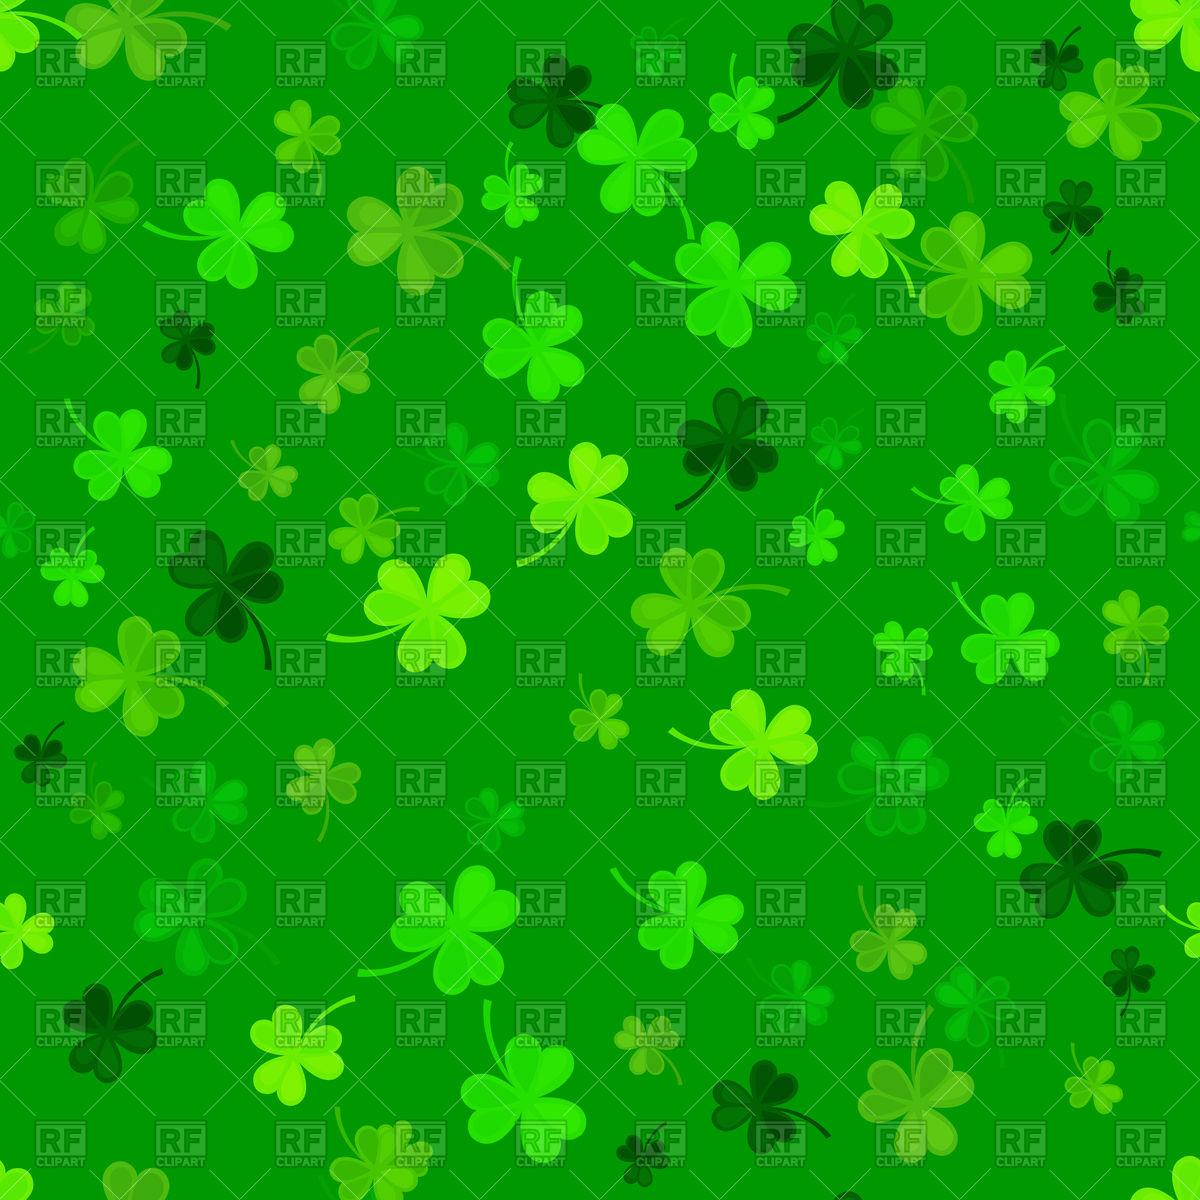 St Patricks Day clover seamless pattern on a green 1200x1200